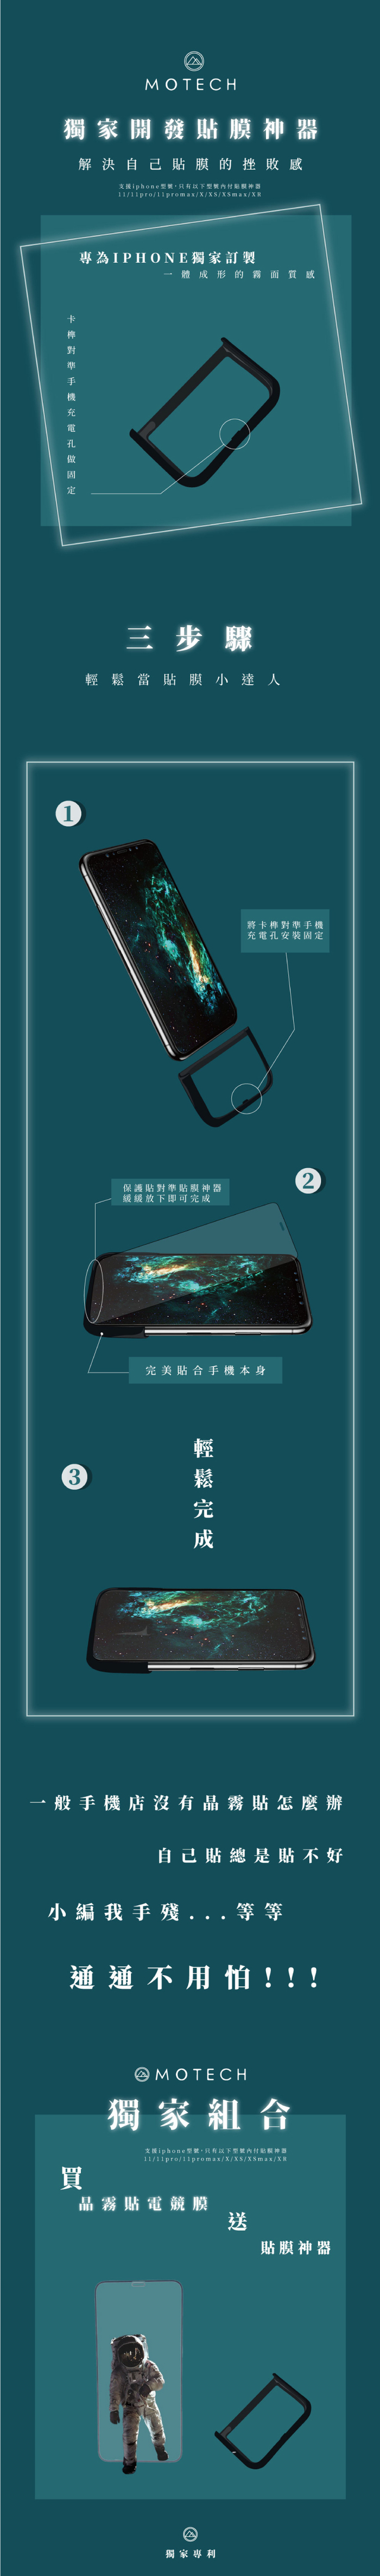 MOTECH|【獨家專利】 晶霧貼 超細高透 電競專用 iPhone 保護貼